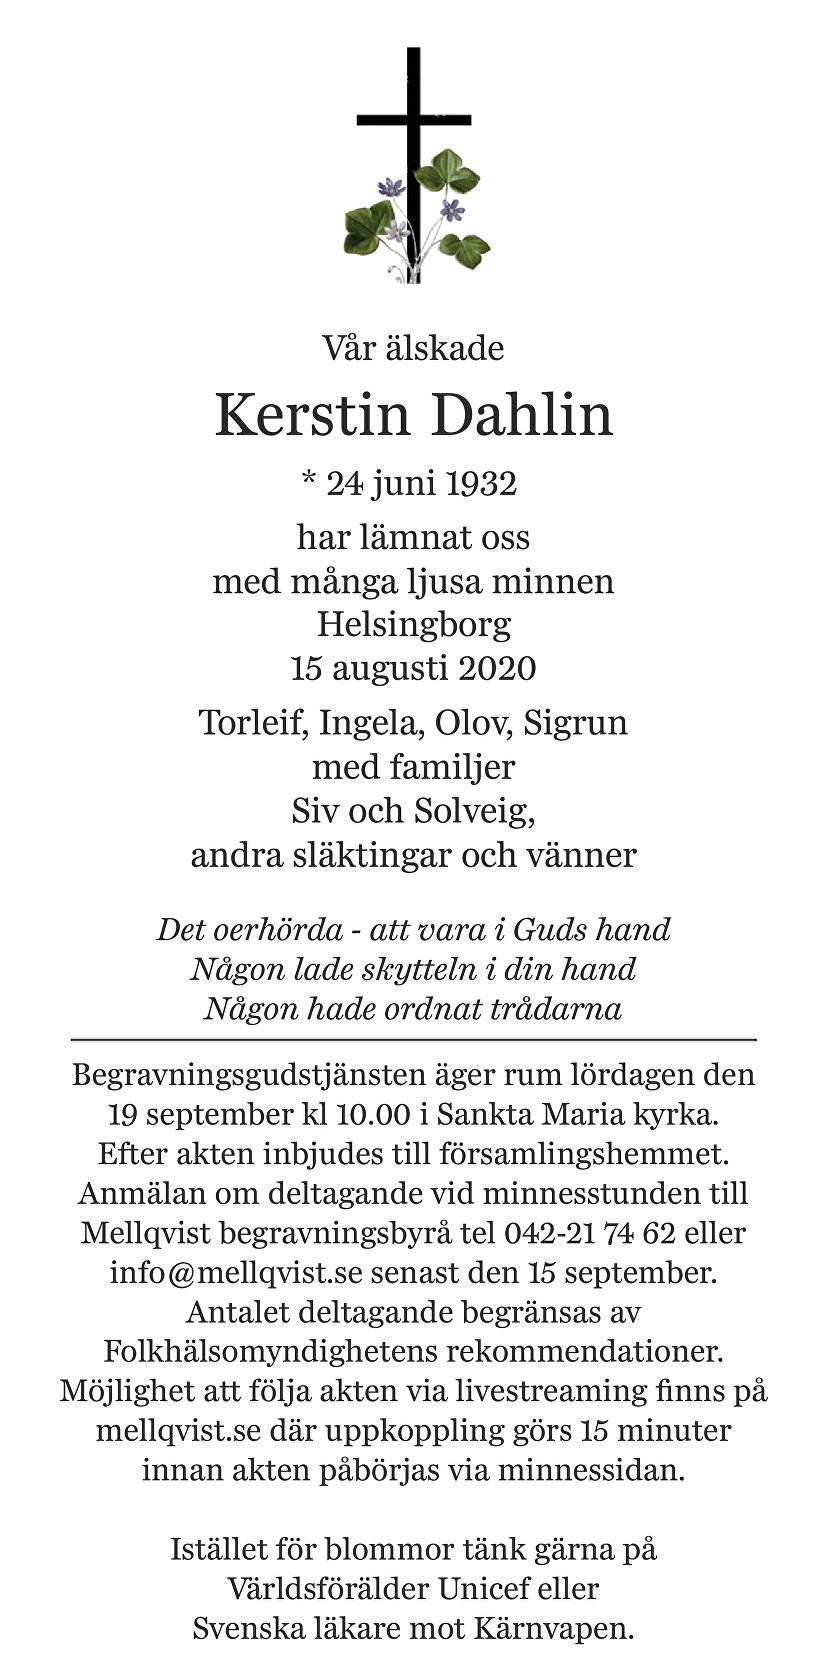 Kerstin Dahlin Death notice